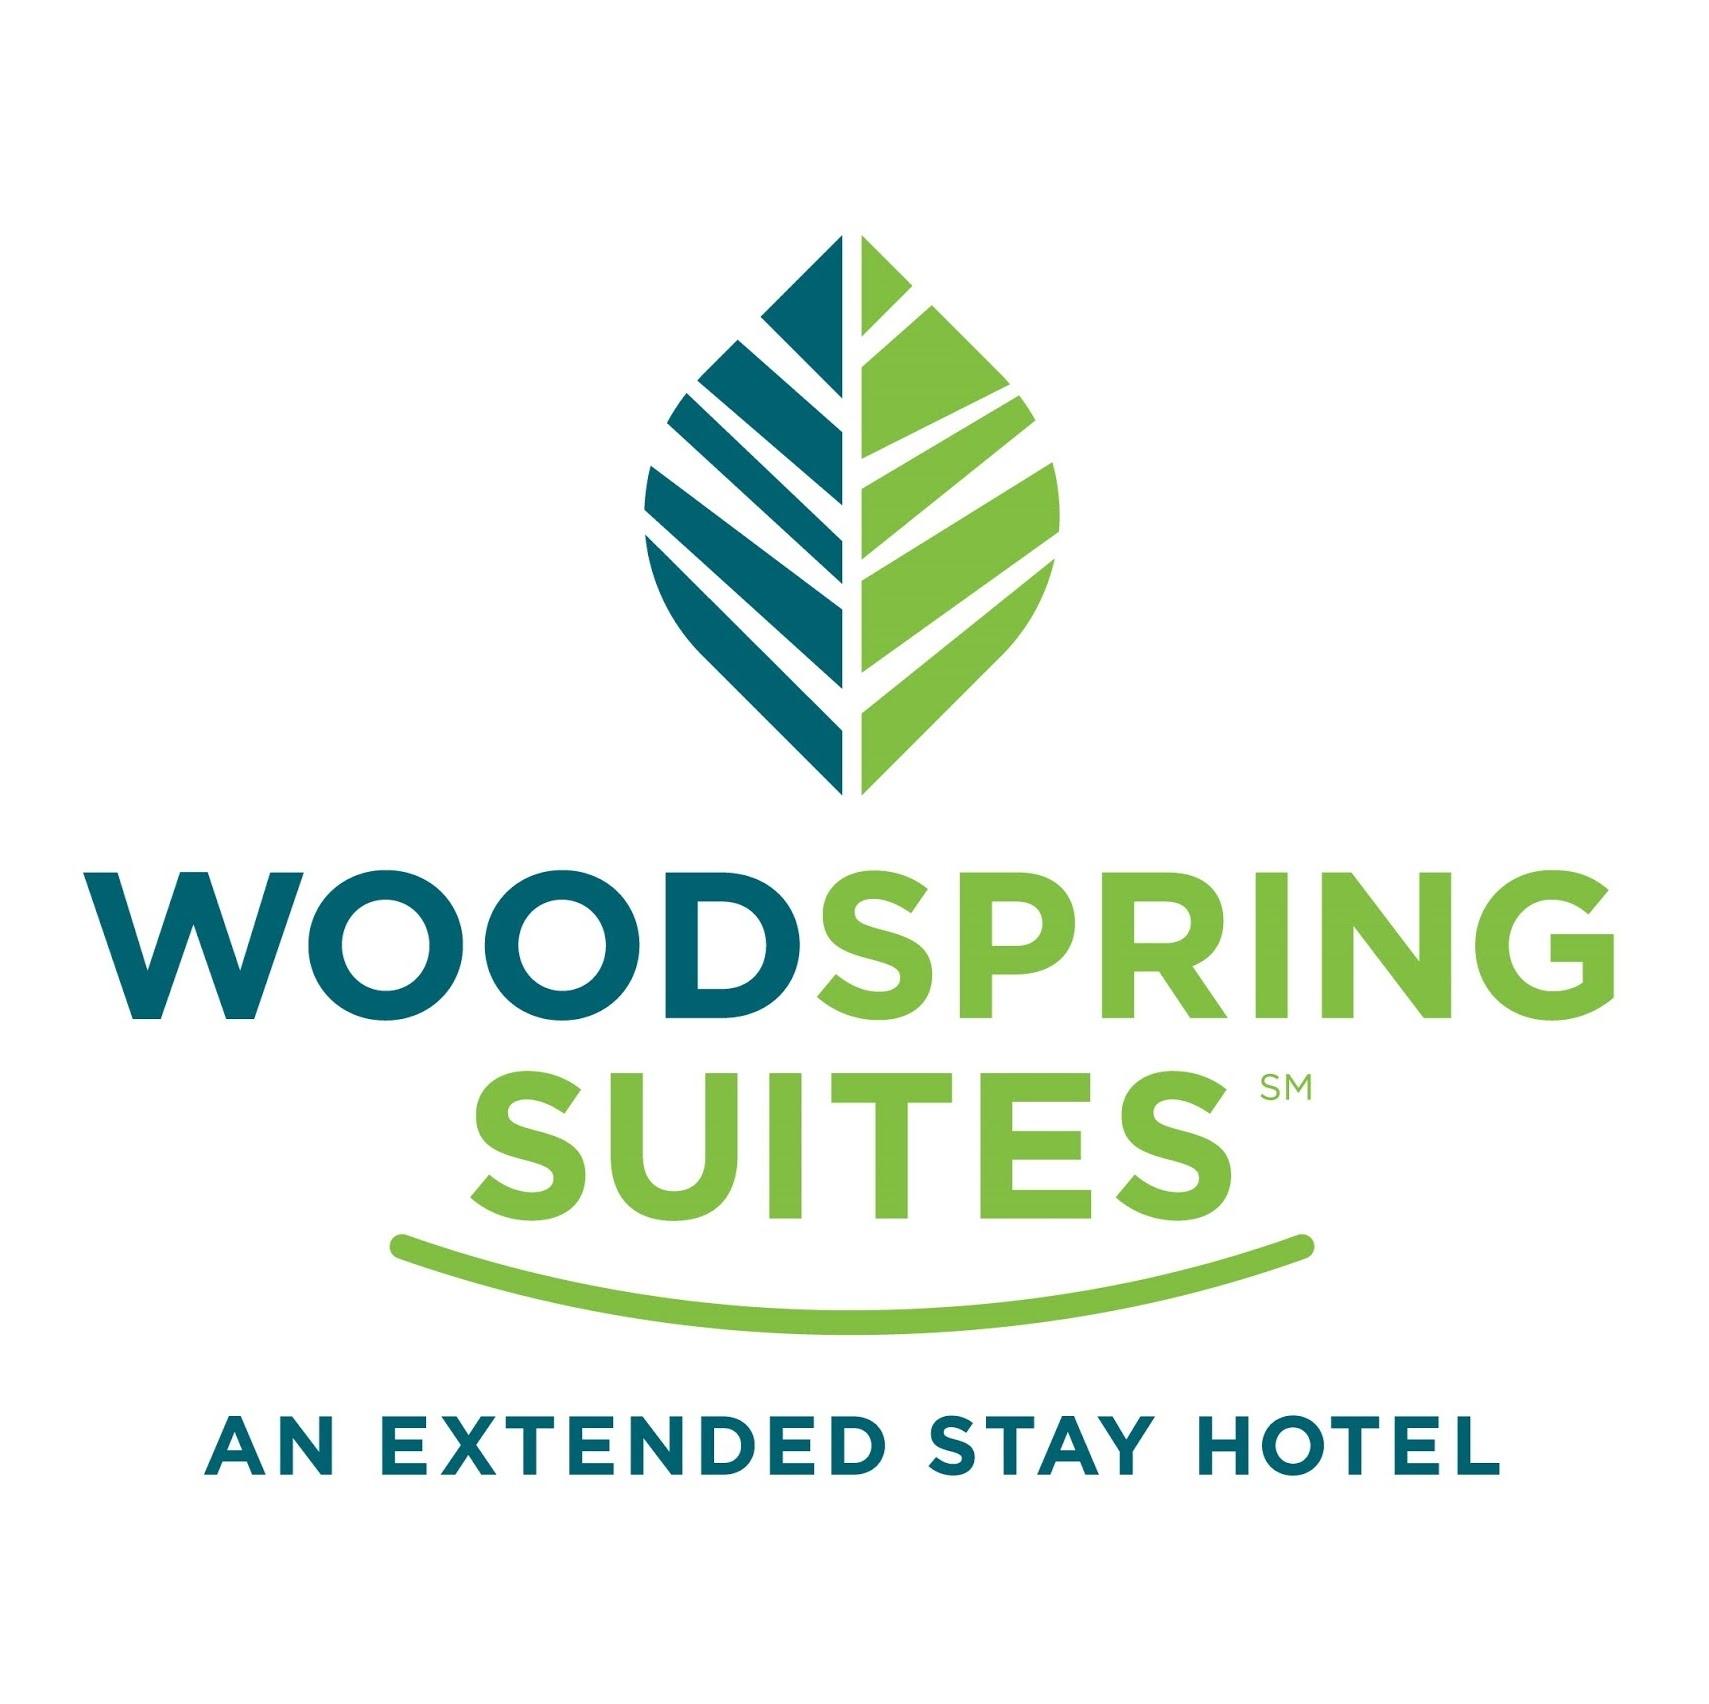 WoodSpring Suites Akron, Akron Ohio (OH) - LocalDatabase.com